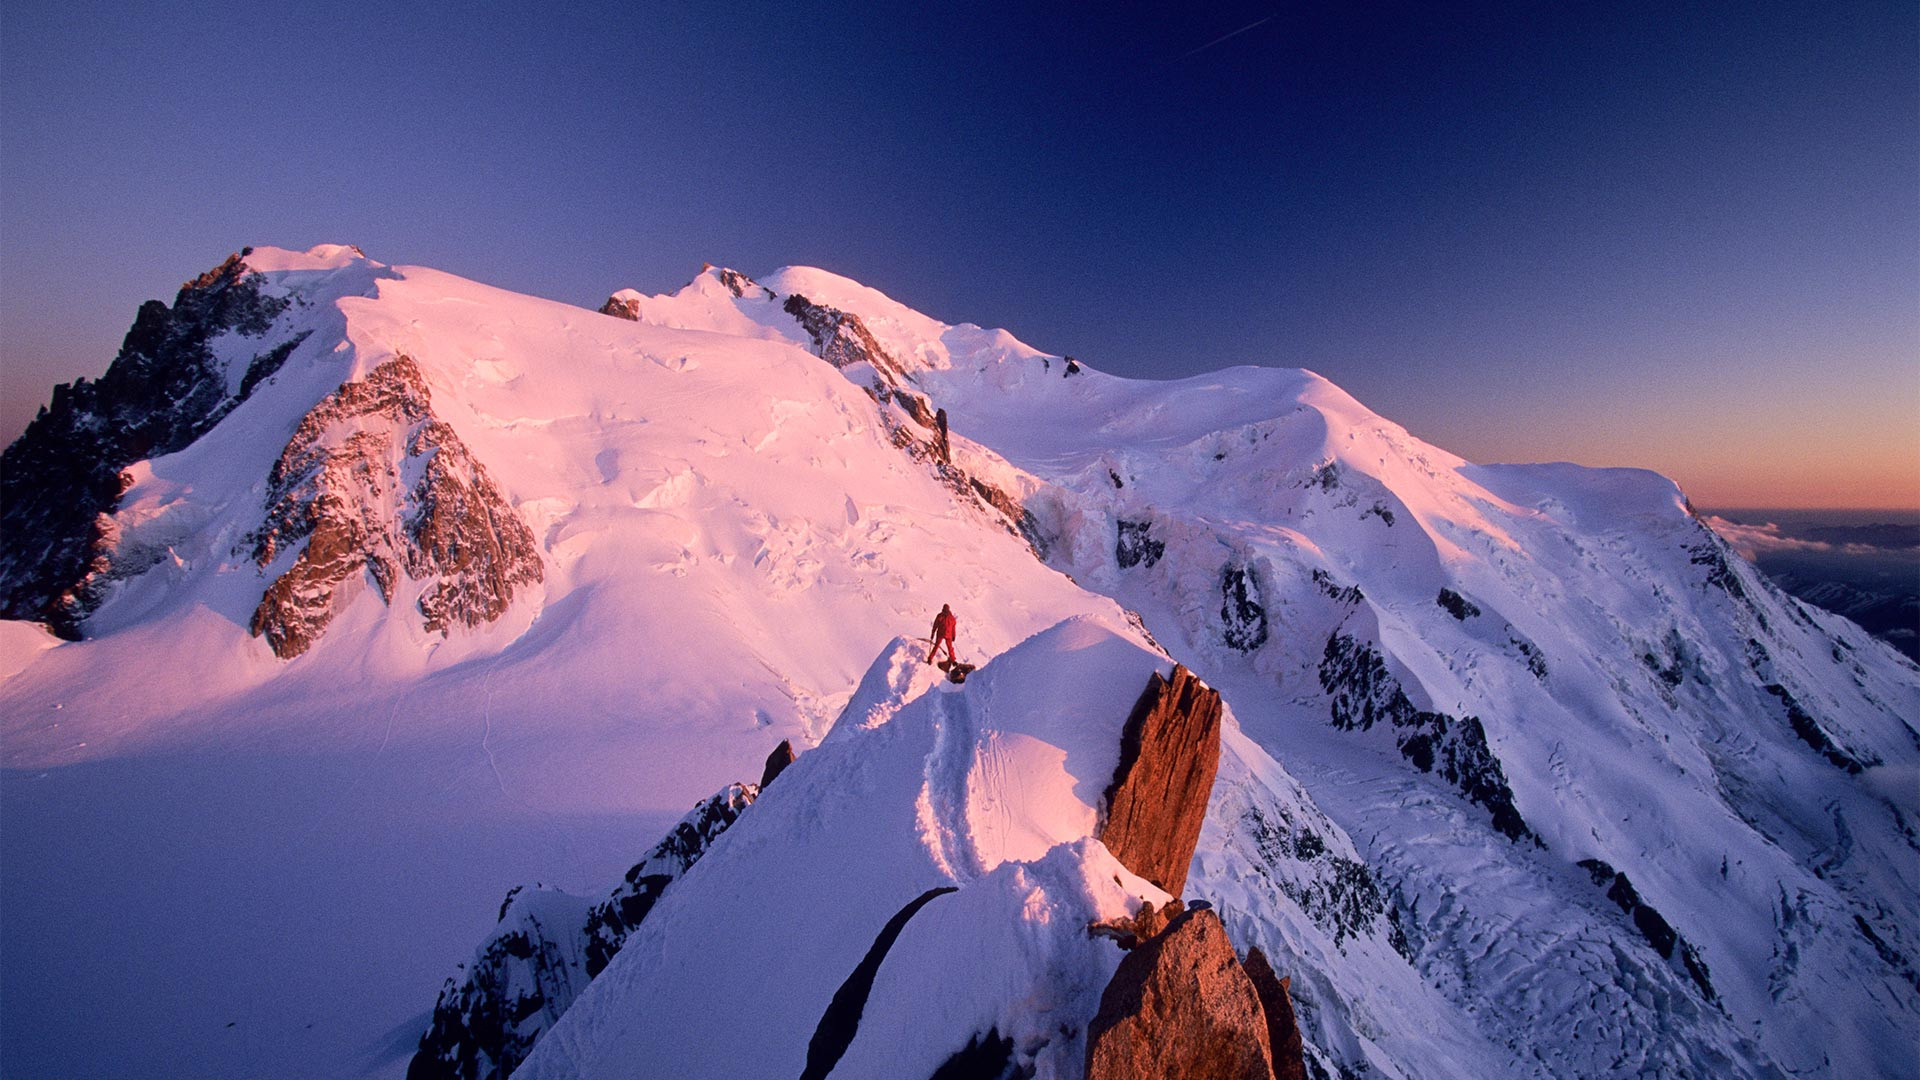 Mountaineering near Chamonix, France